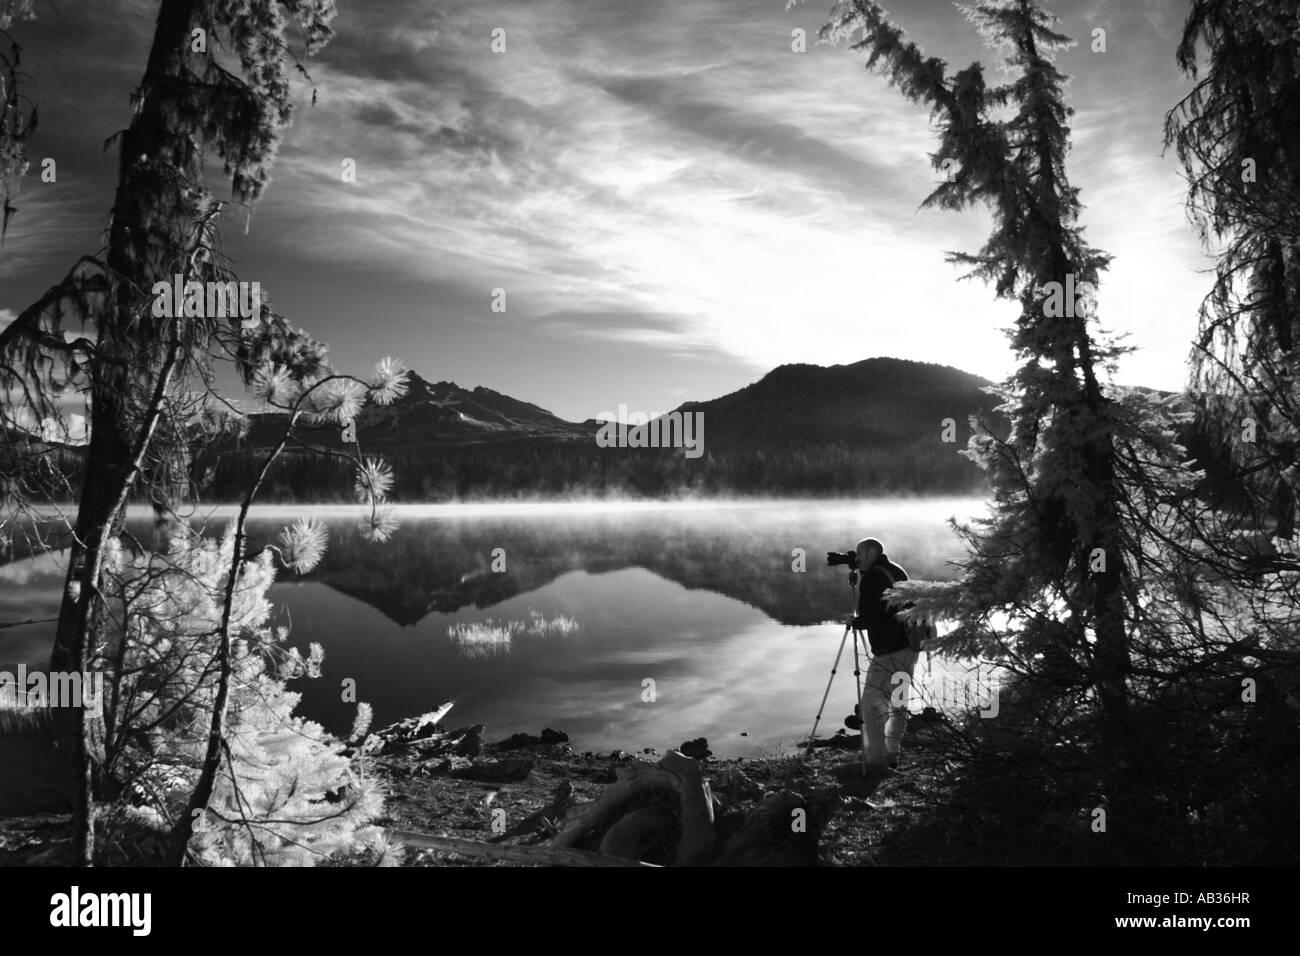 Photographer taking photos at Sparks Lake Central Oregon USA - Stock Image